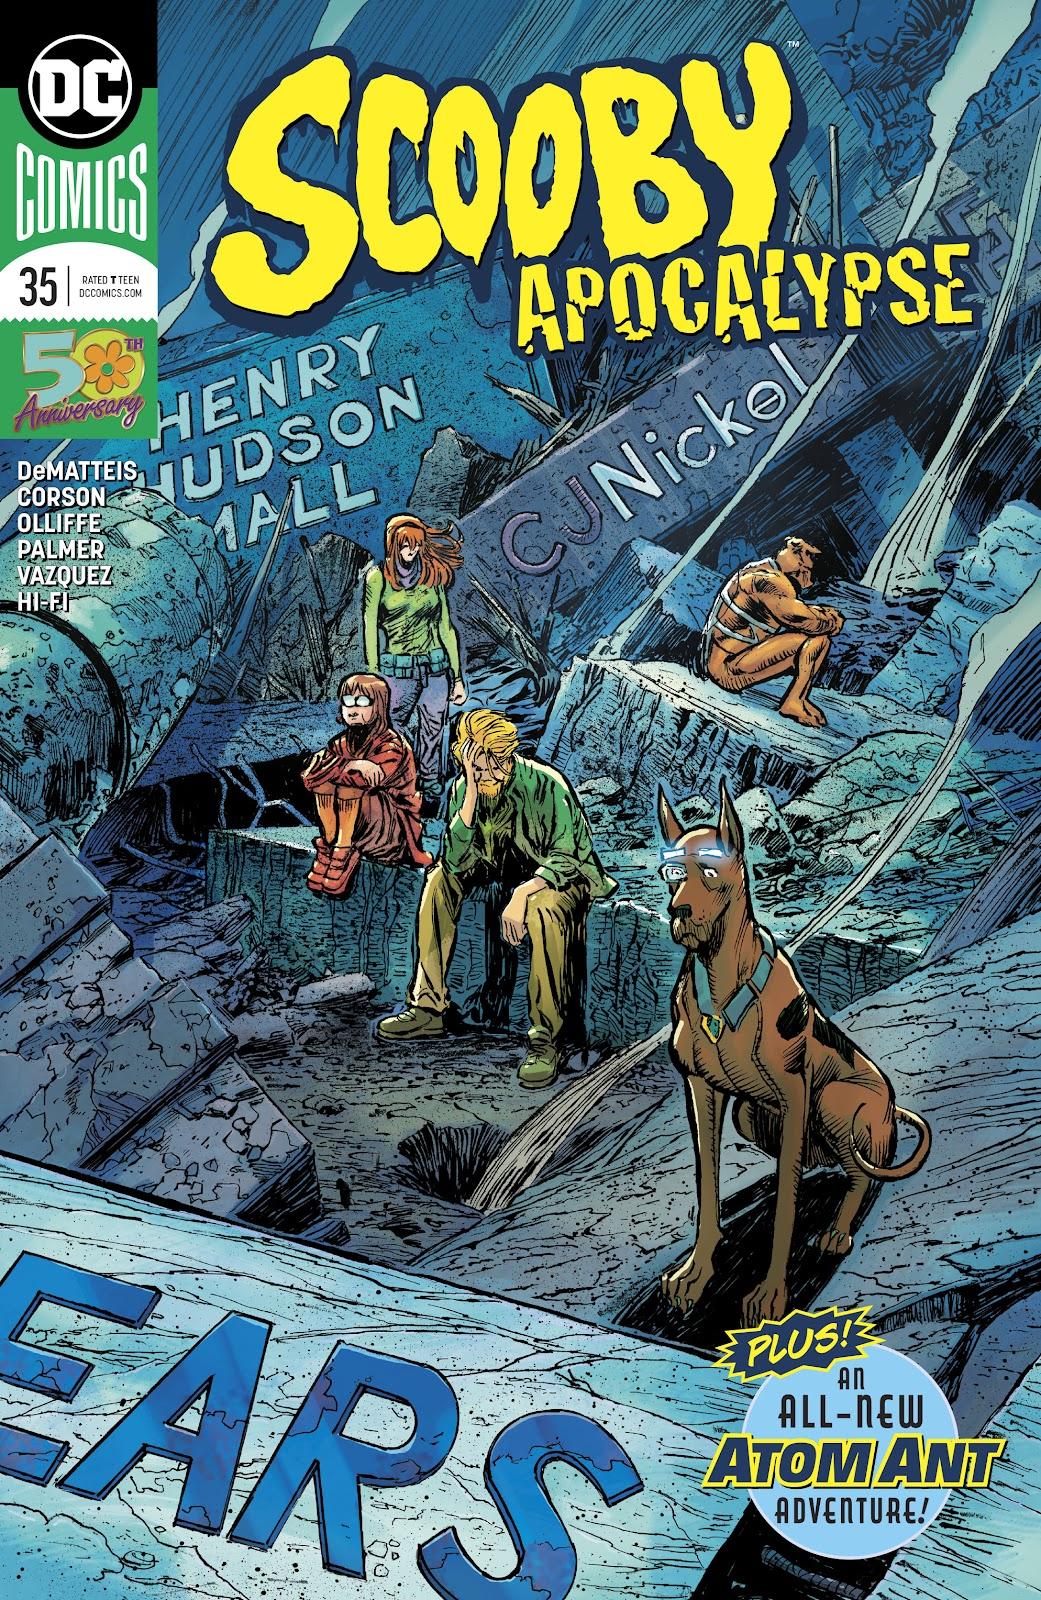 Read online Scooby Apocalypse comic -  Issue #35 - 1